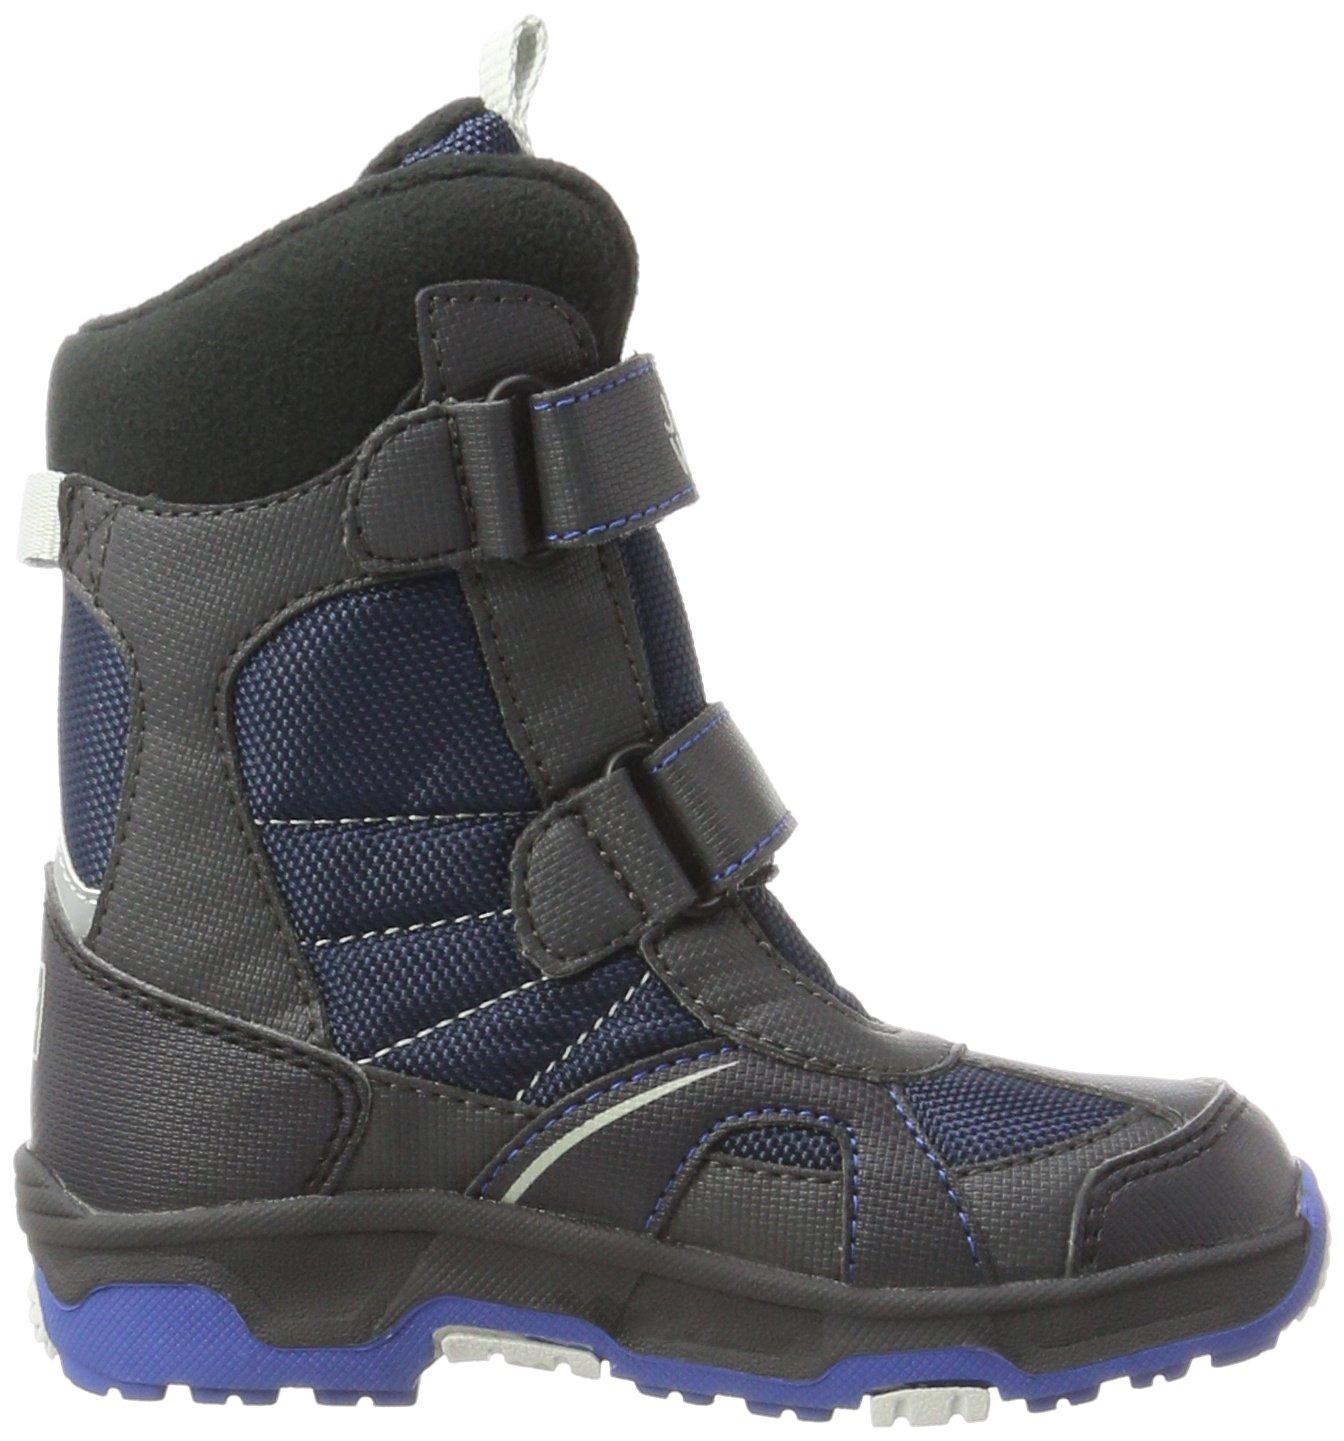 Jack Wolfskin Boy's S Polar Bear Texapore Snow Boots Child 6